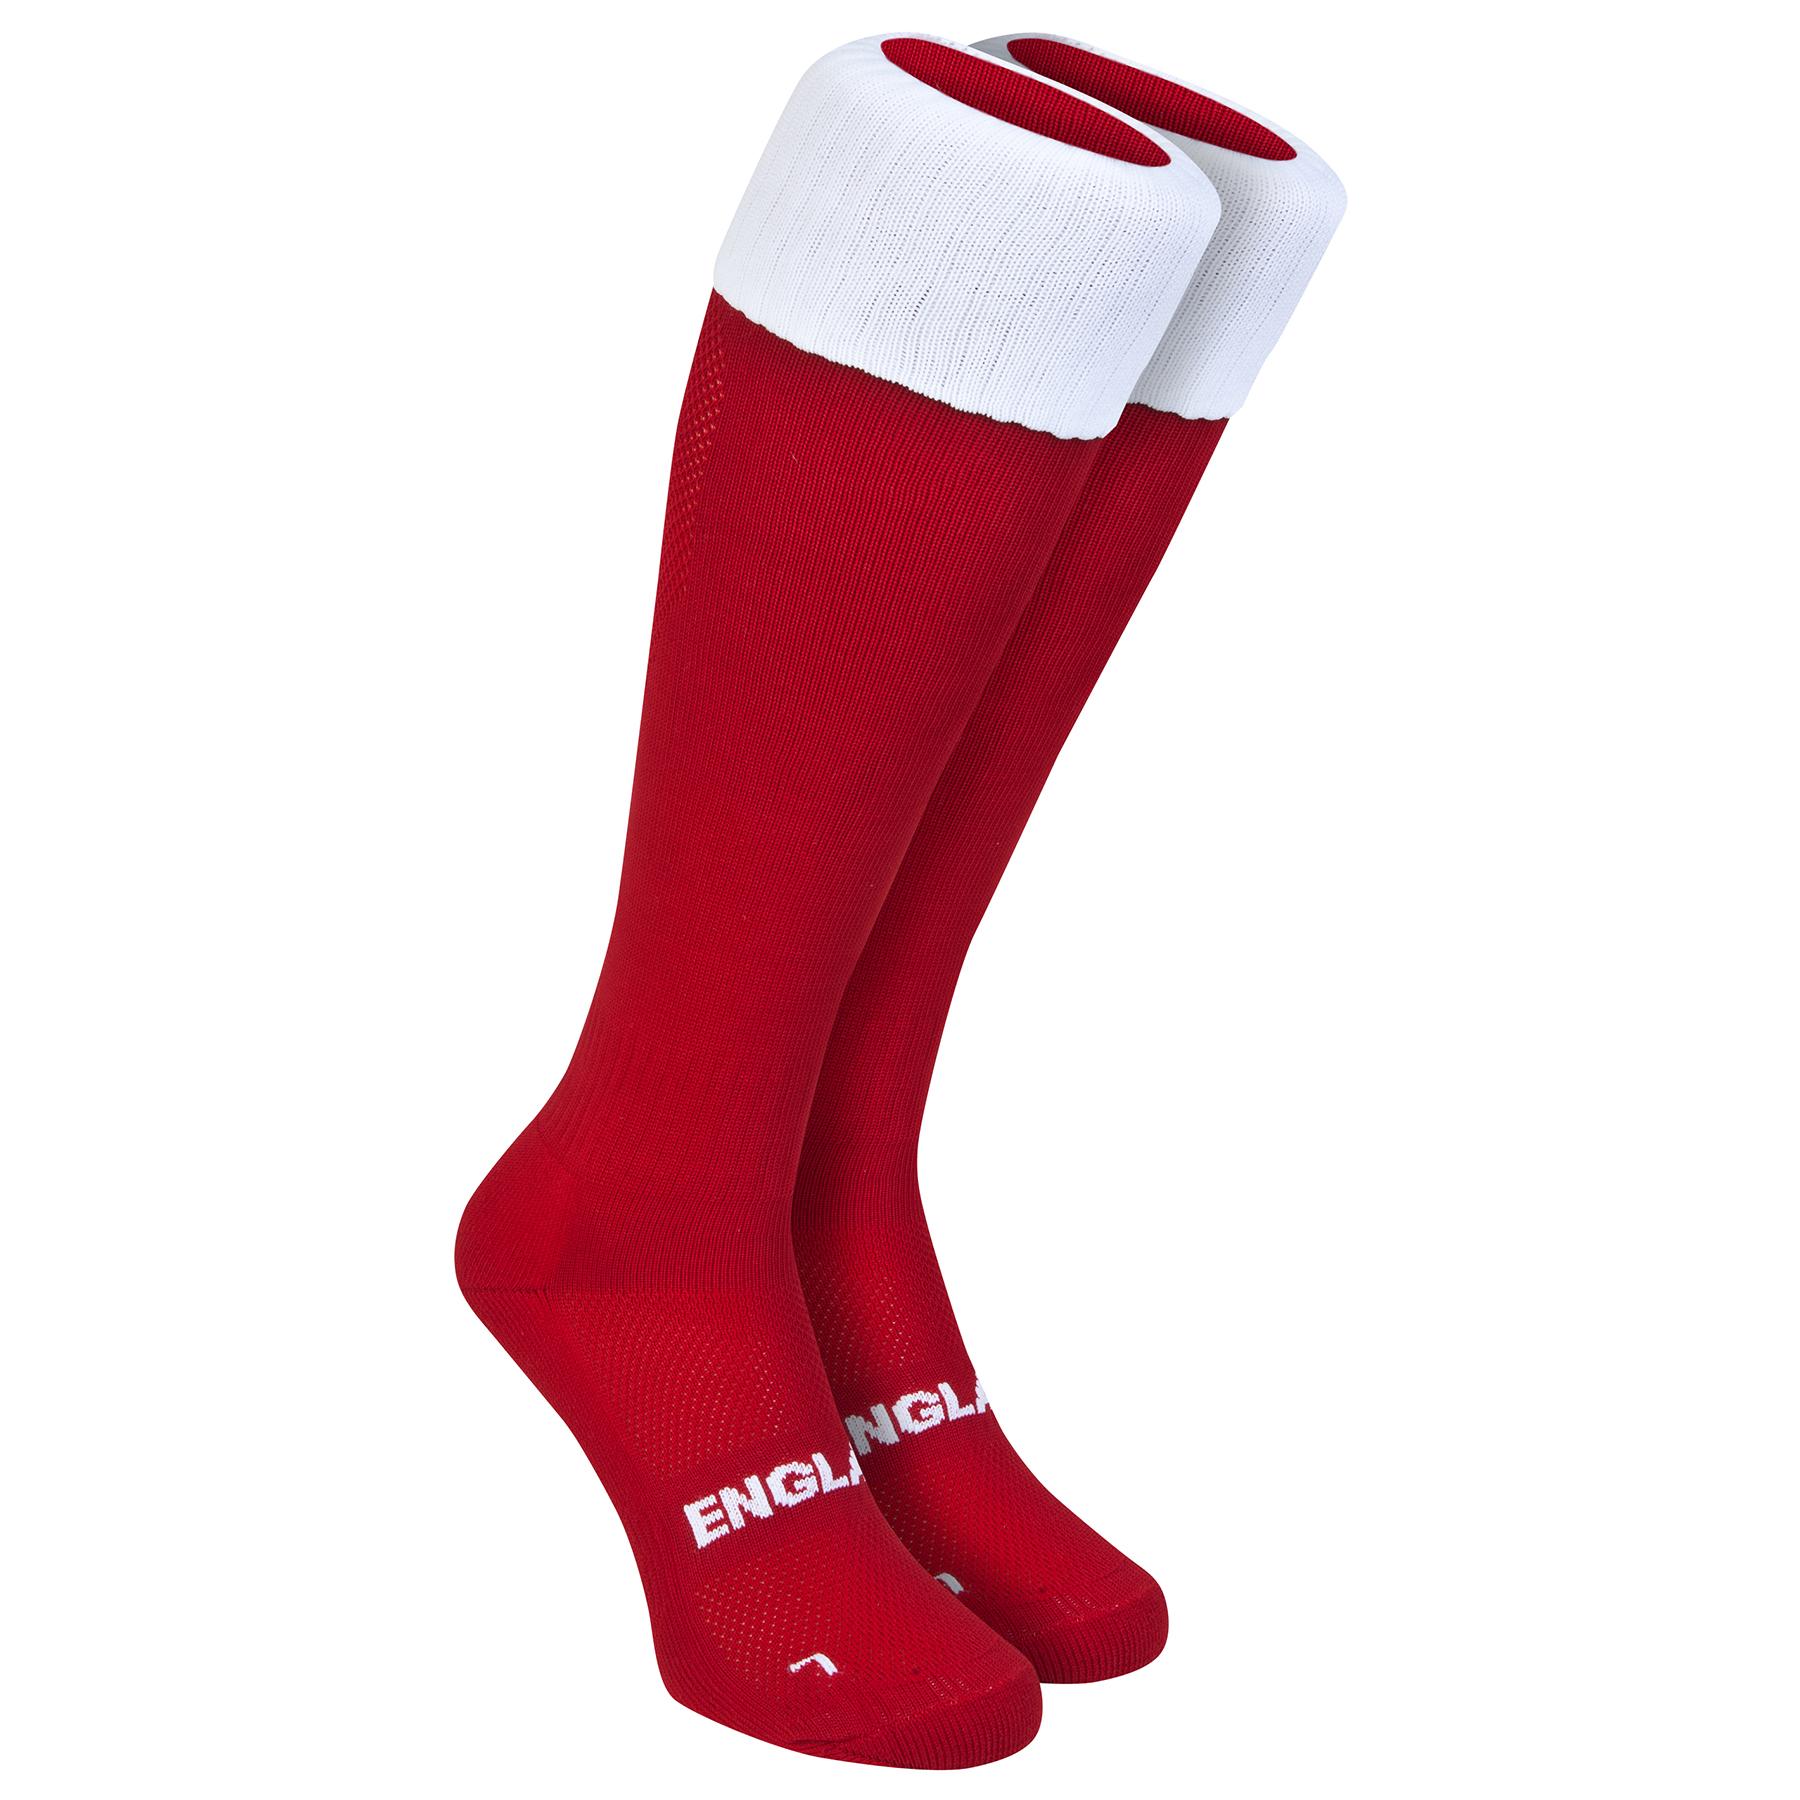 England Alternate Sock 2014/15 Red